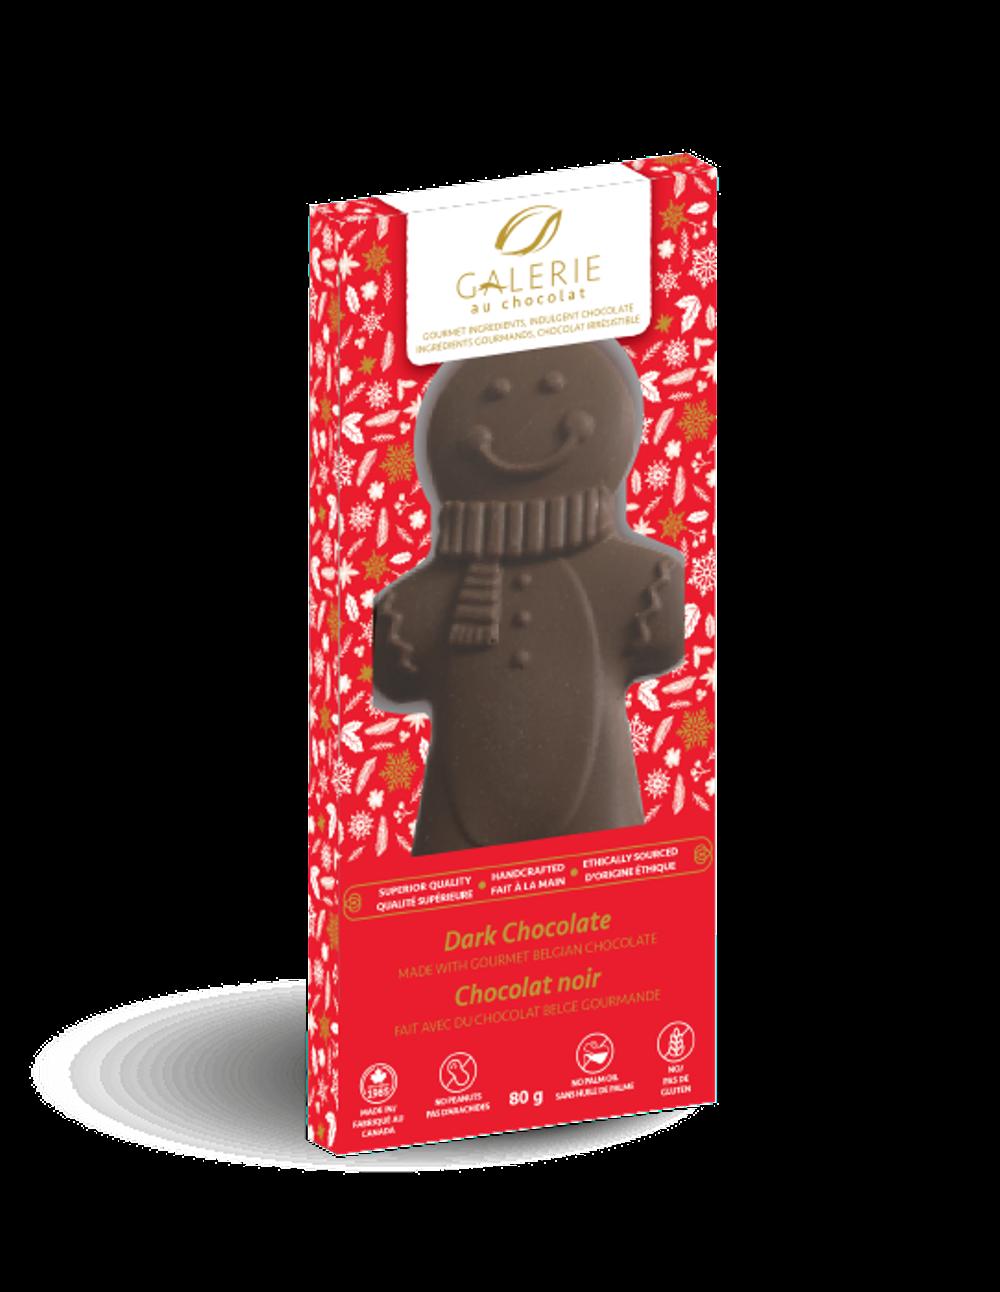 Dark Chocolate Gingerbread Man Shaped Bar